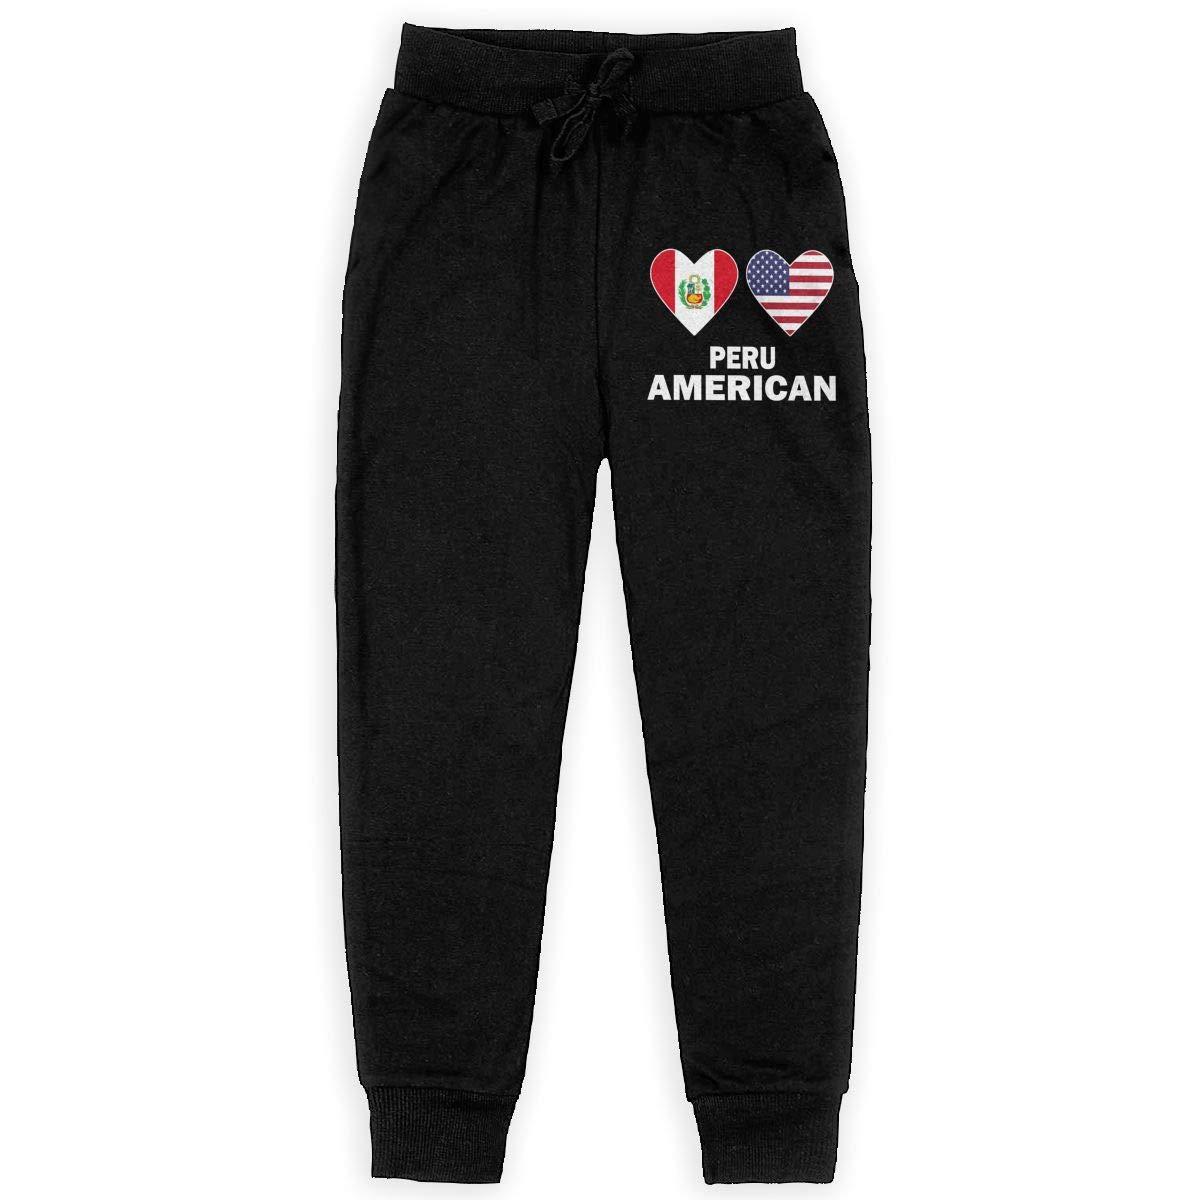 Teenager Active Pants Teenager Girls WYZVK22 Peru American Hearts Soft//Cozy Sweatpants